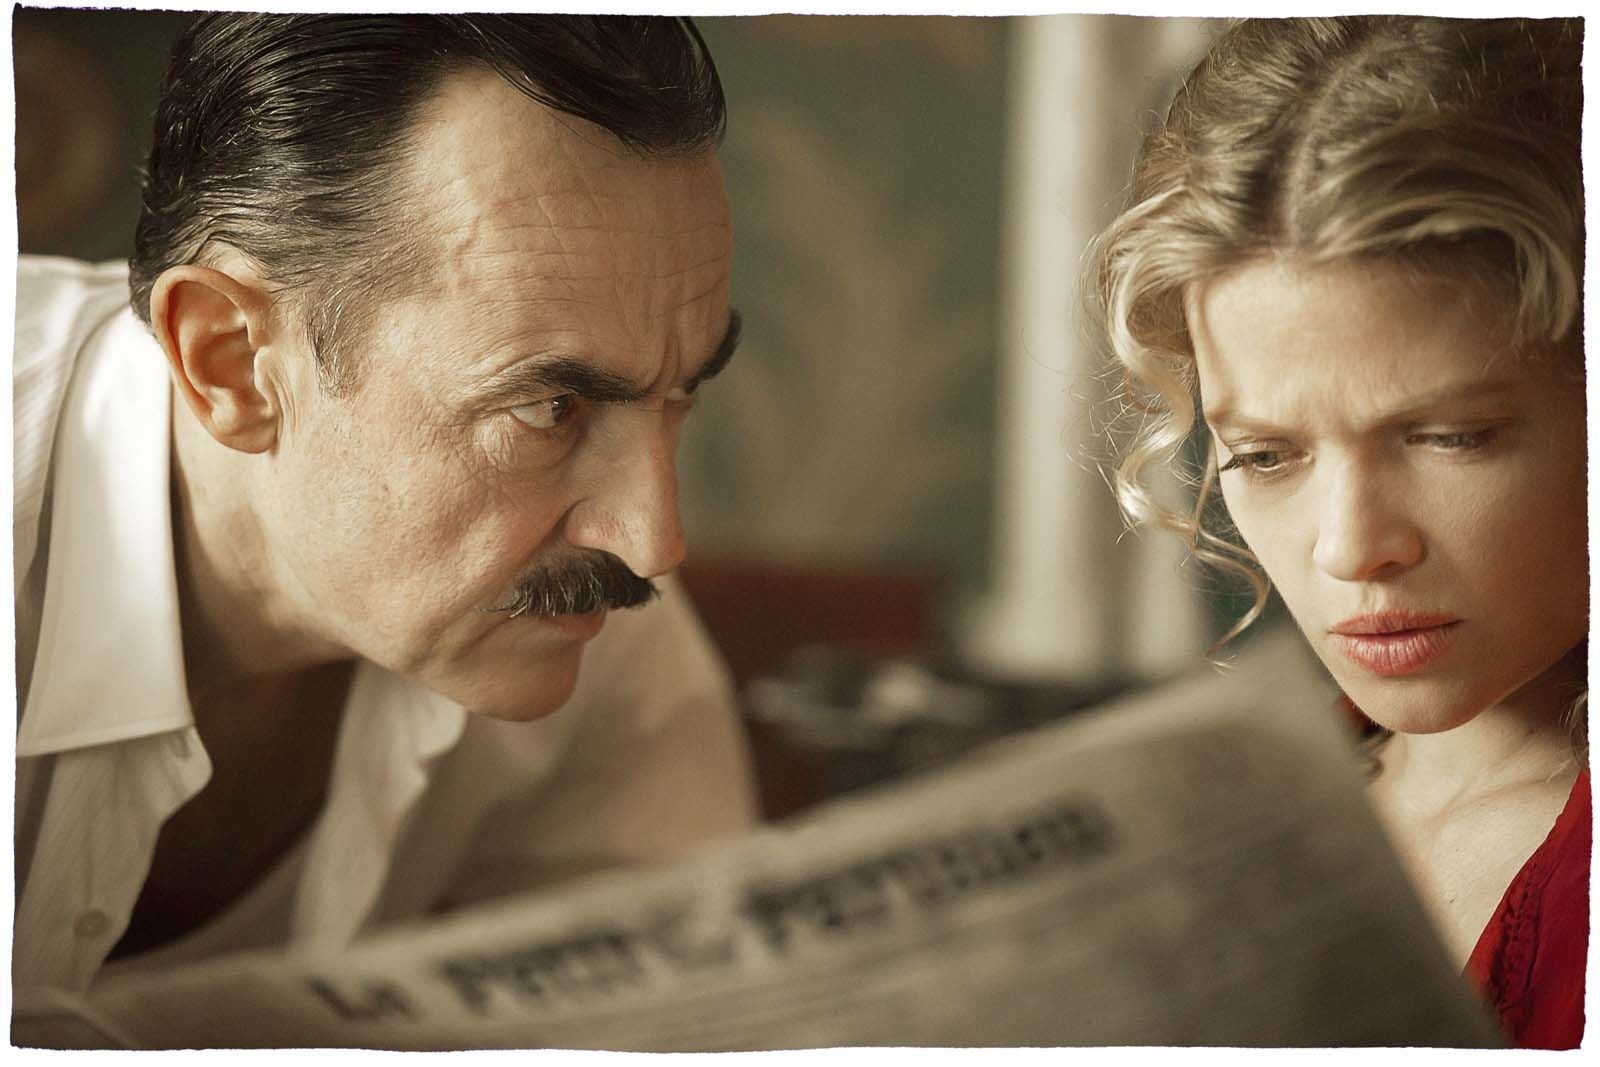 Au Revoir La Haut 2017 Film Complet French Hd Inspirational Movies Film Cinema